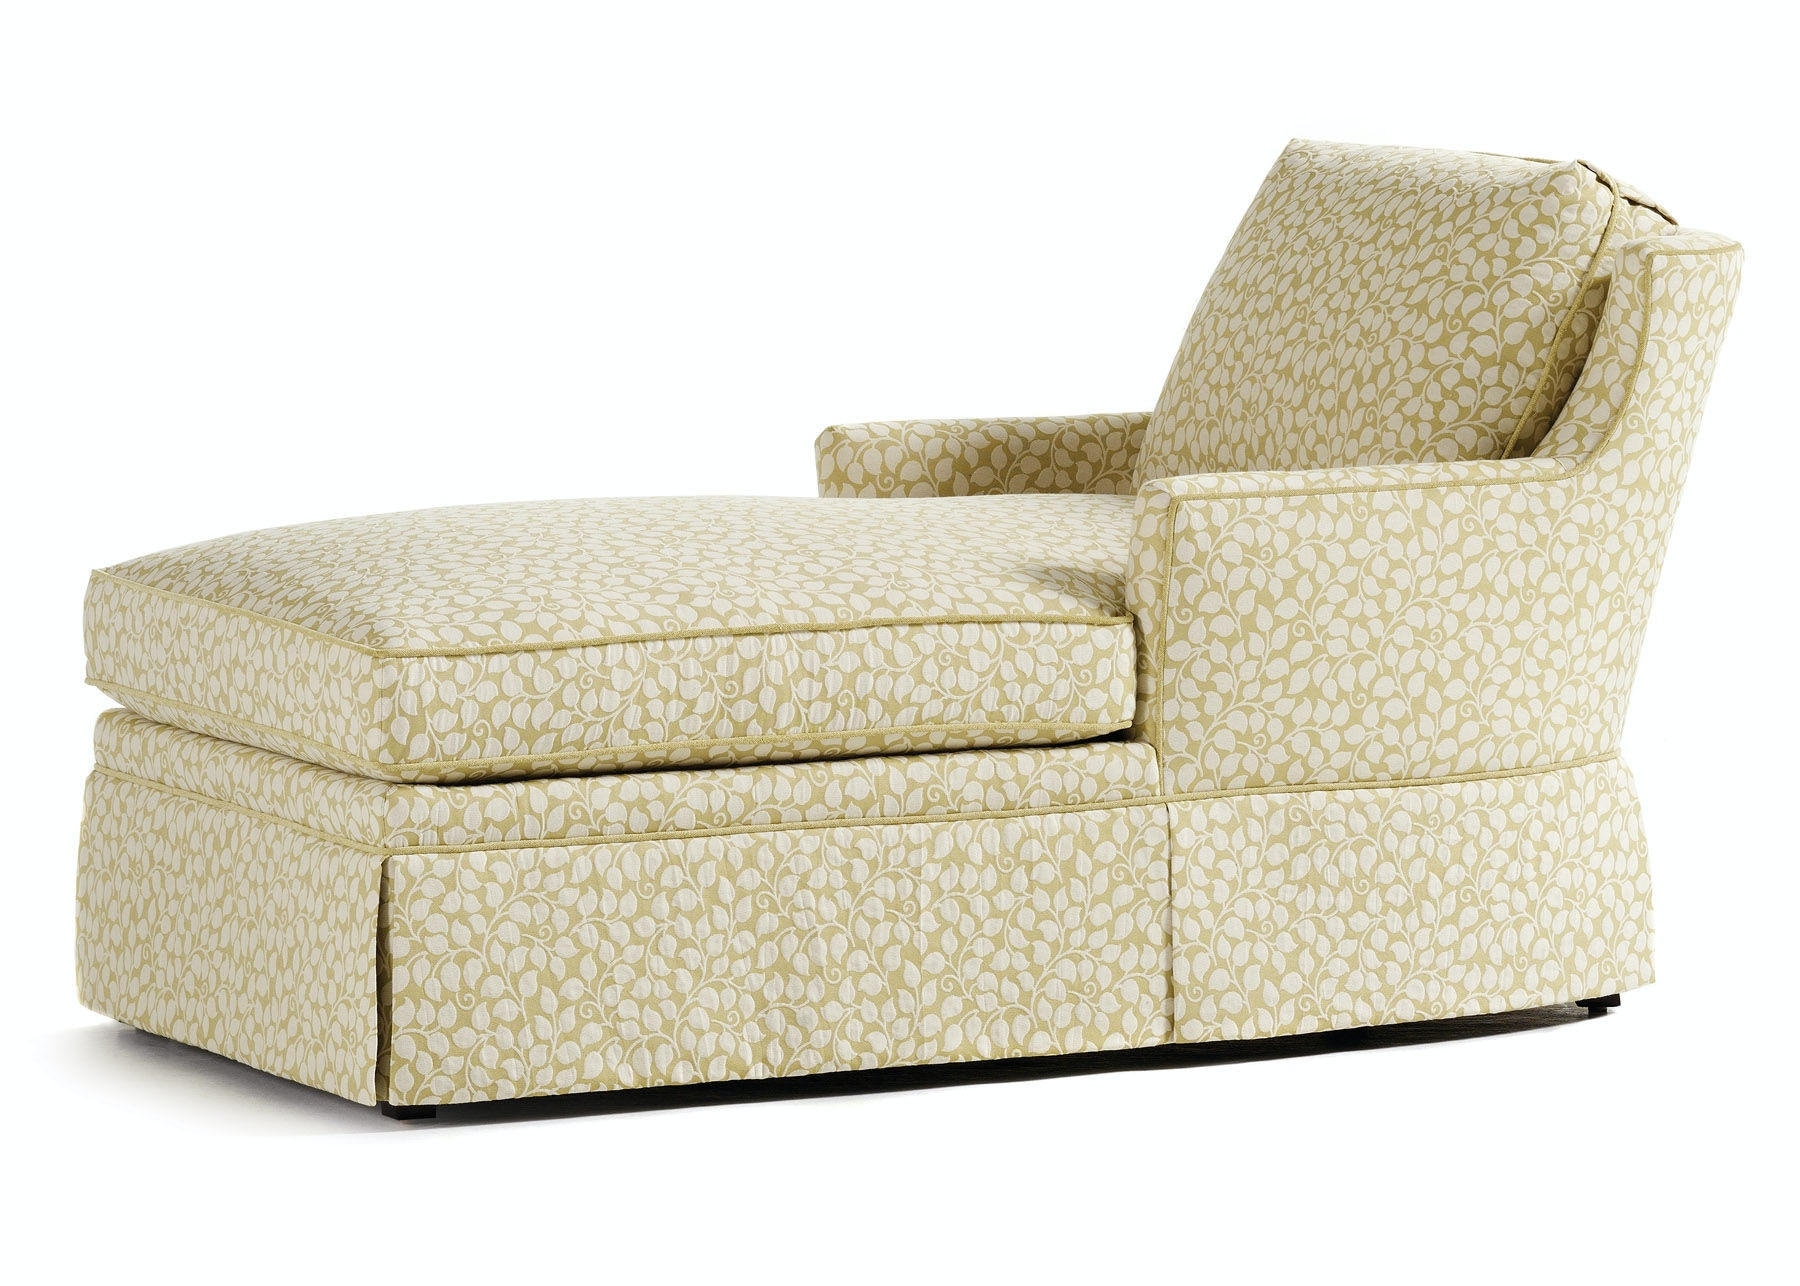 5x Lounge Chair : Living room chaise lounges los angeles ca von hemert interiors